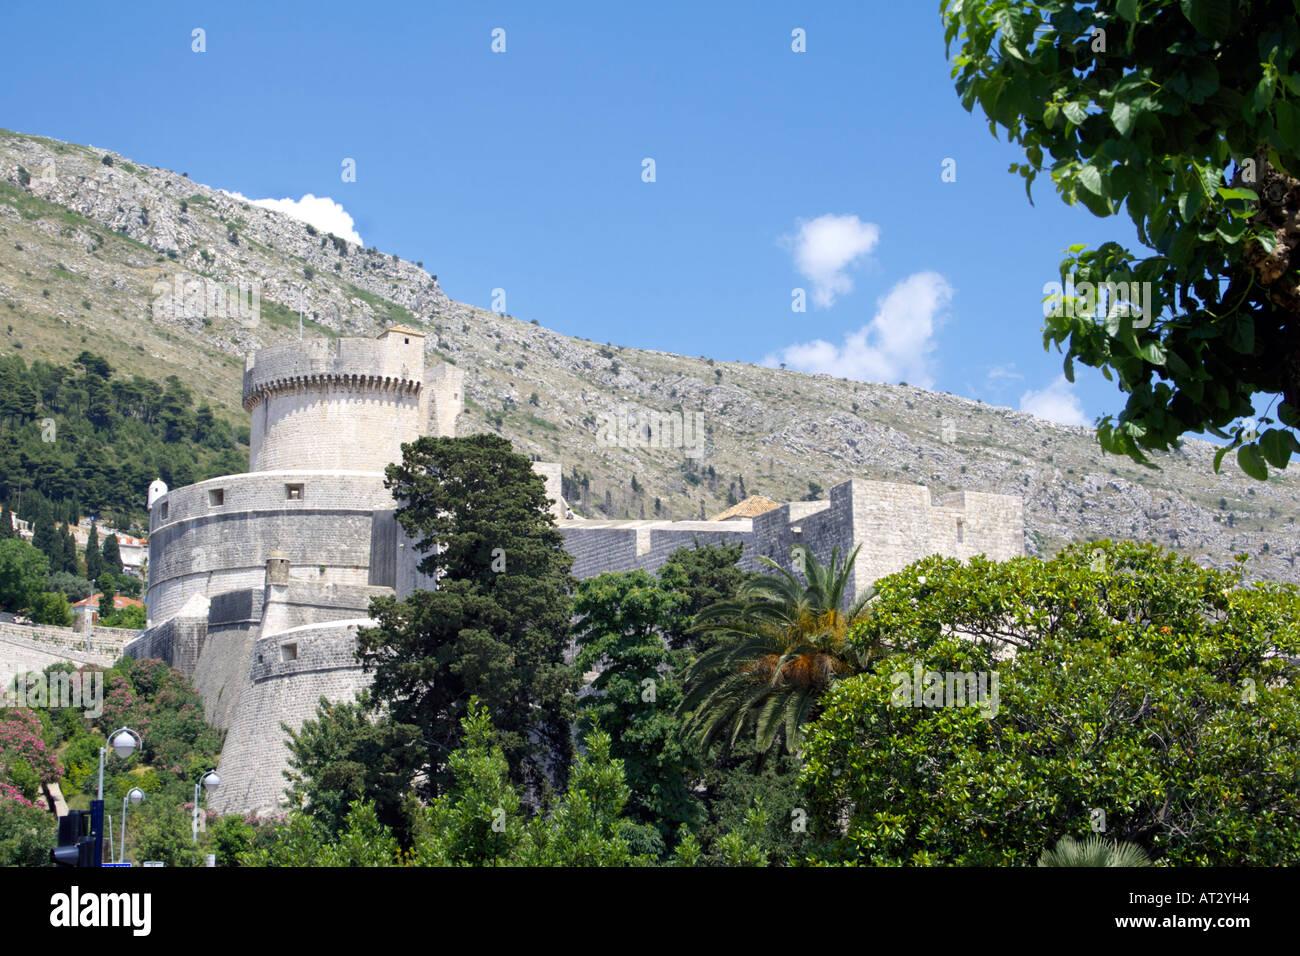 Minceta Fortress and City Walls, Dubrovnik, Croatia - Stock Image